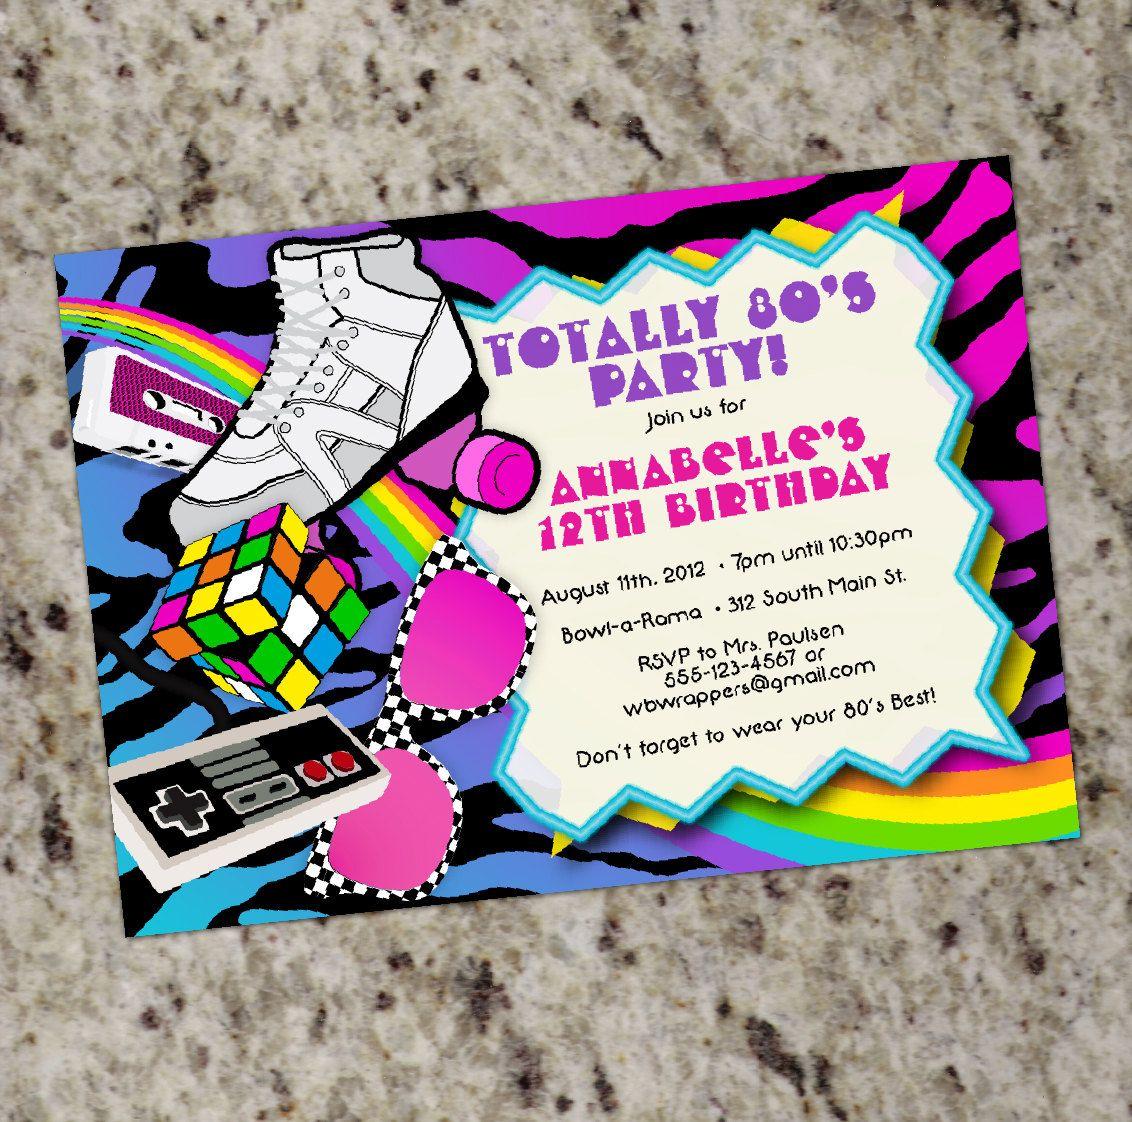 80s Birthday Party Invitations TOTALLY 80s 1980s Themed DIY